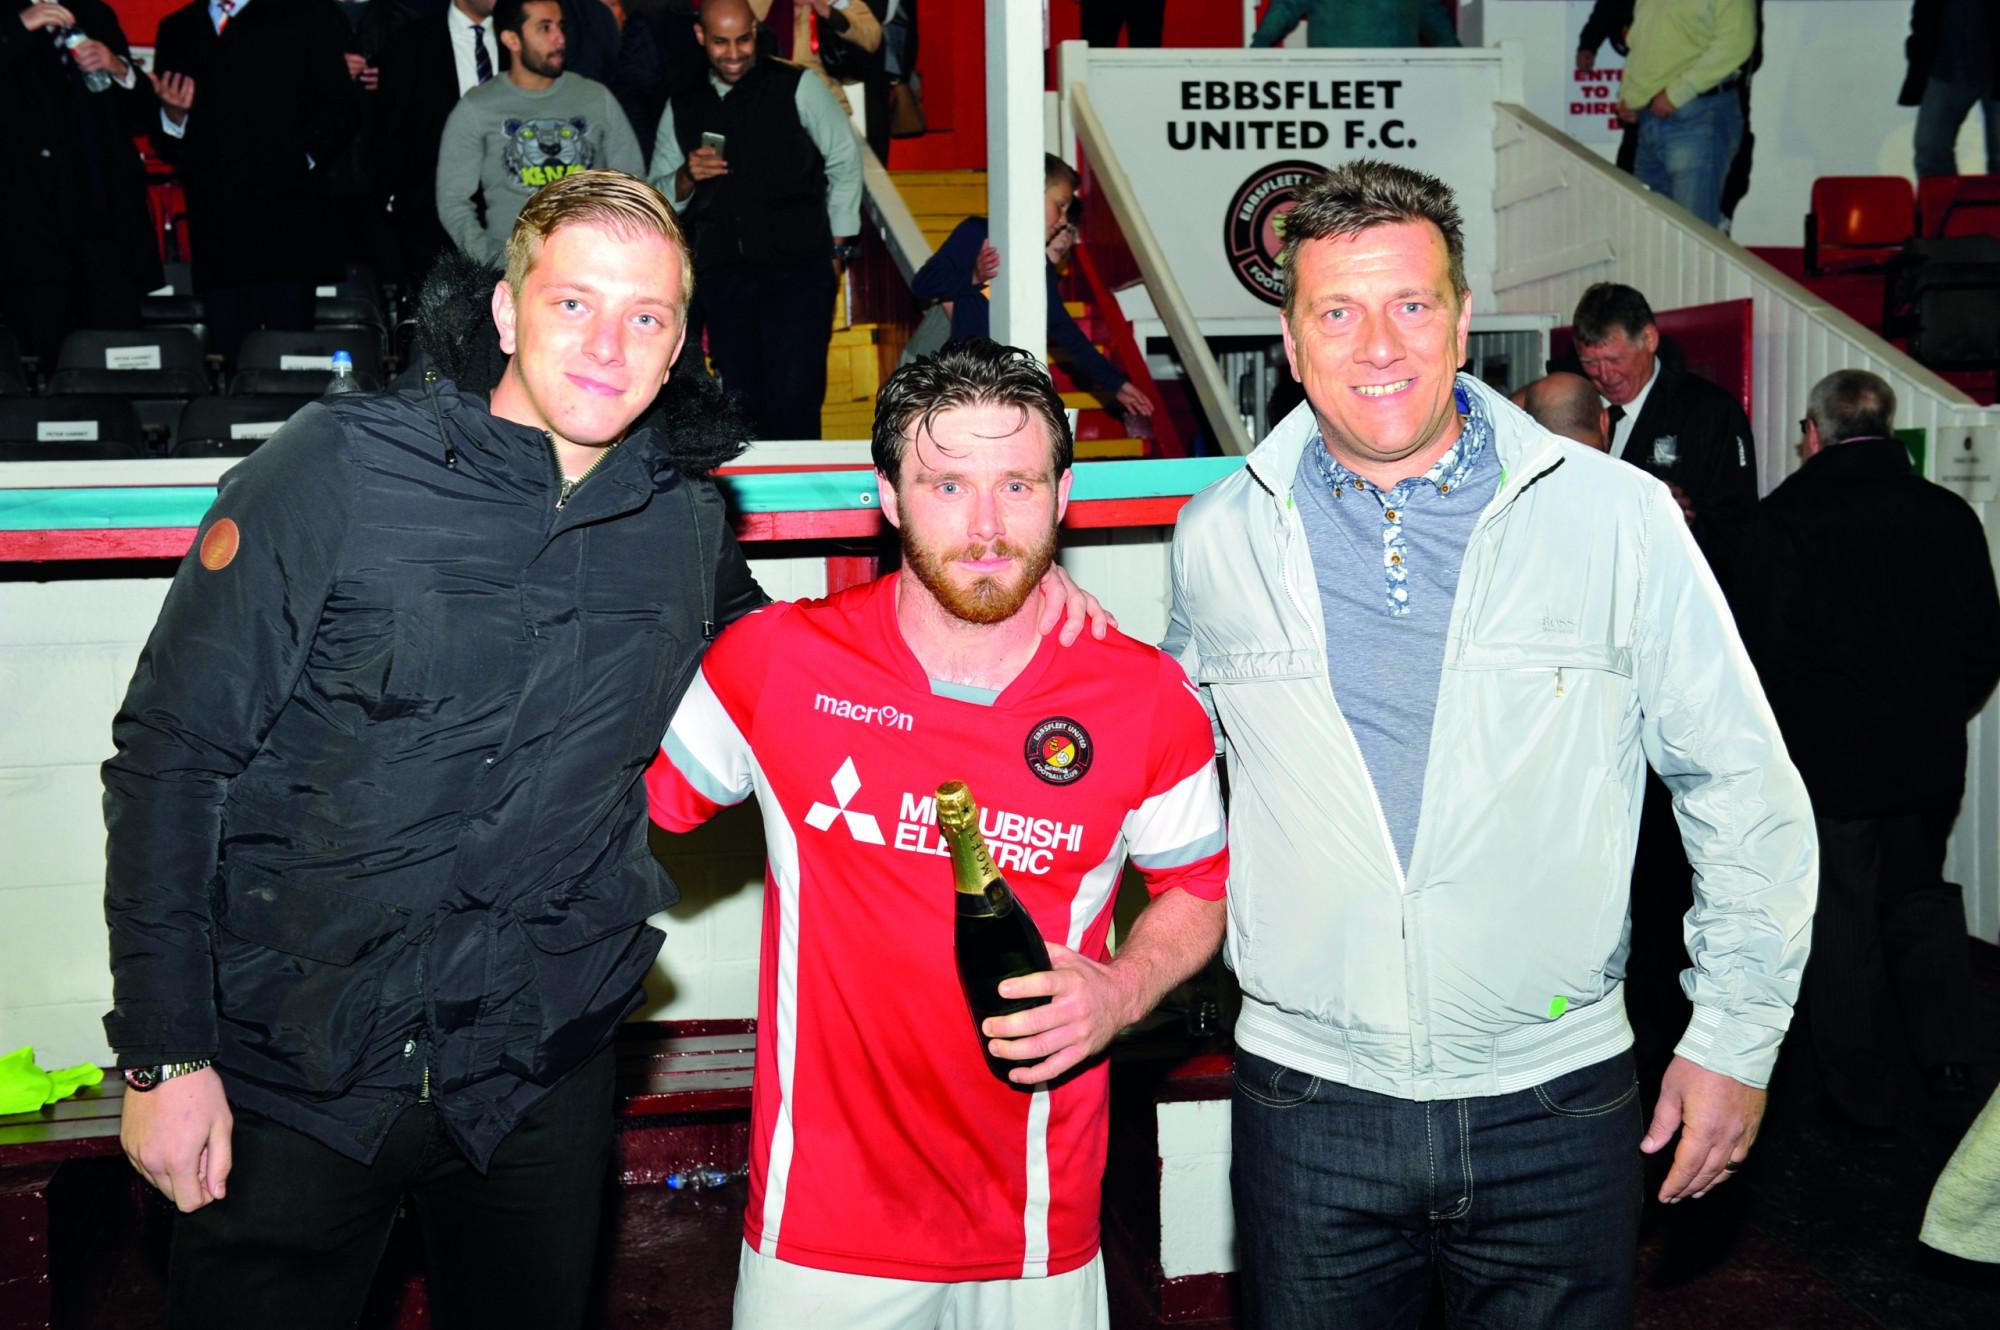 Sponsorship, Ebbsfleet Match